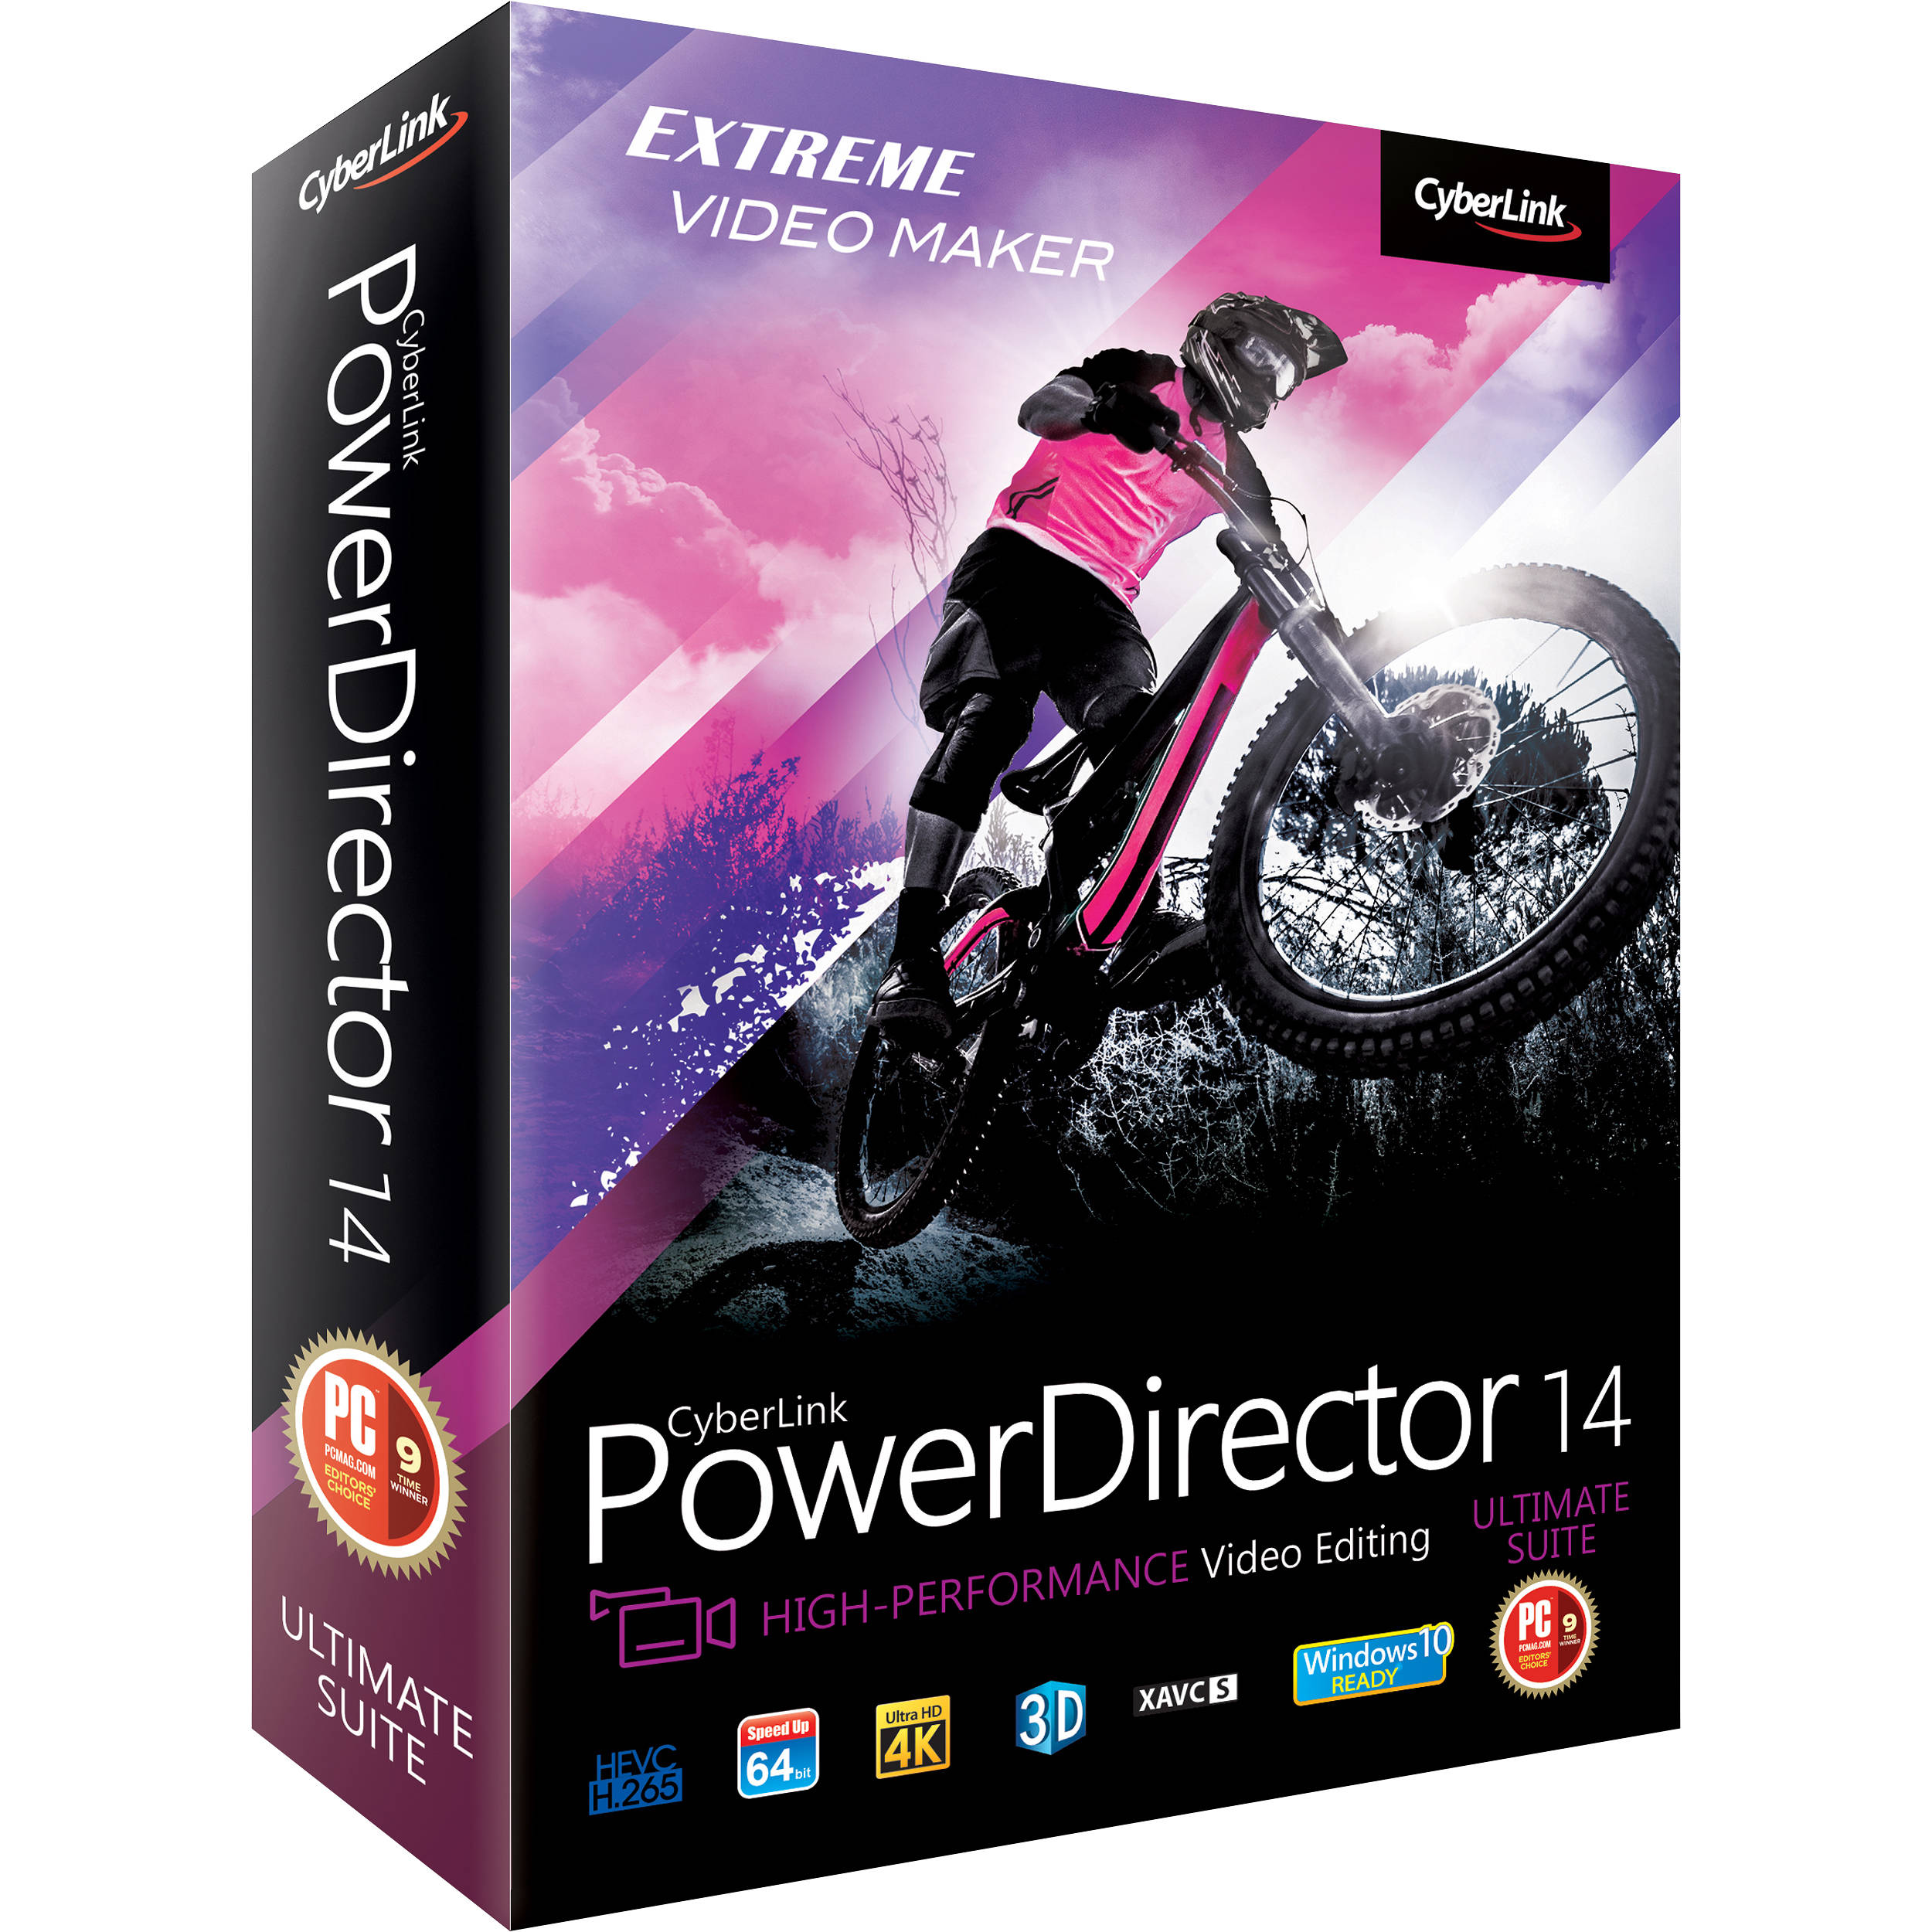 product key to activate cyberlink powerdirector 14